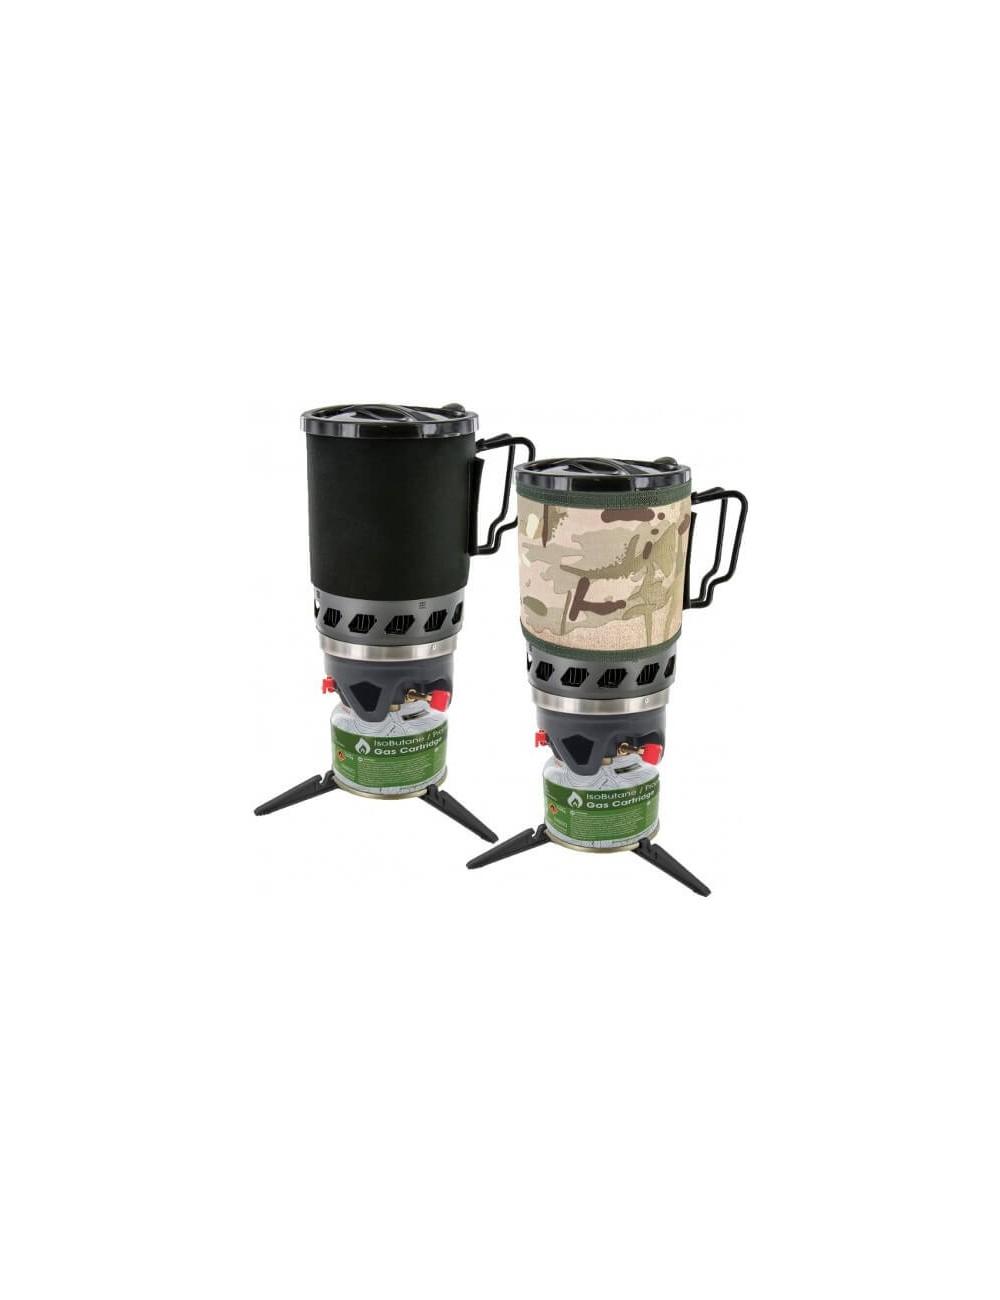 Highlander snelkoker Fastboil MKII - Zwart en Camo